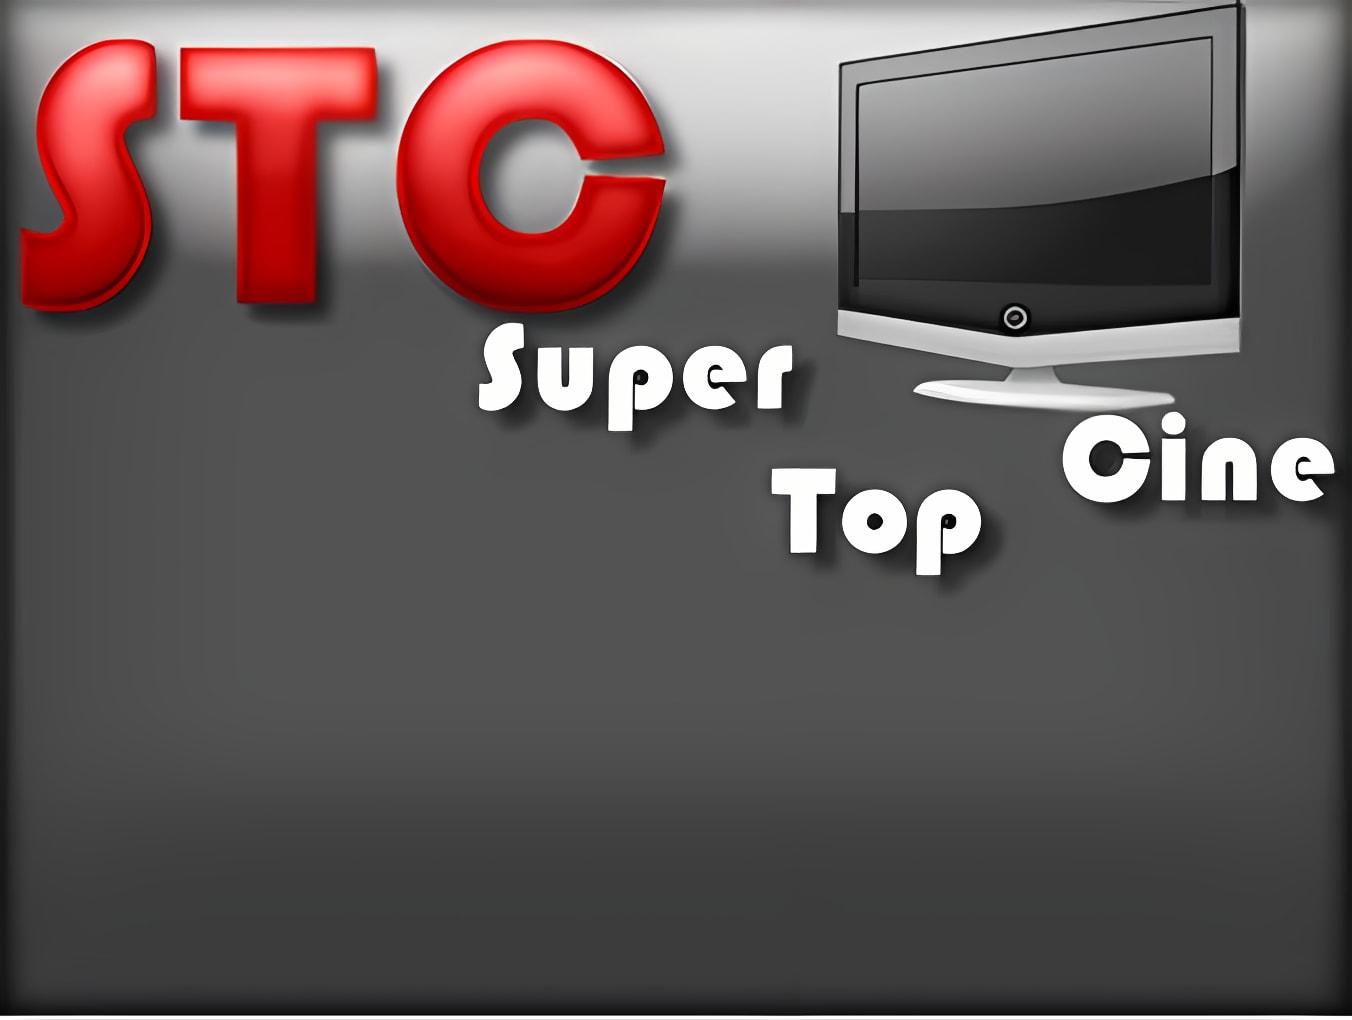 Super Top Cine